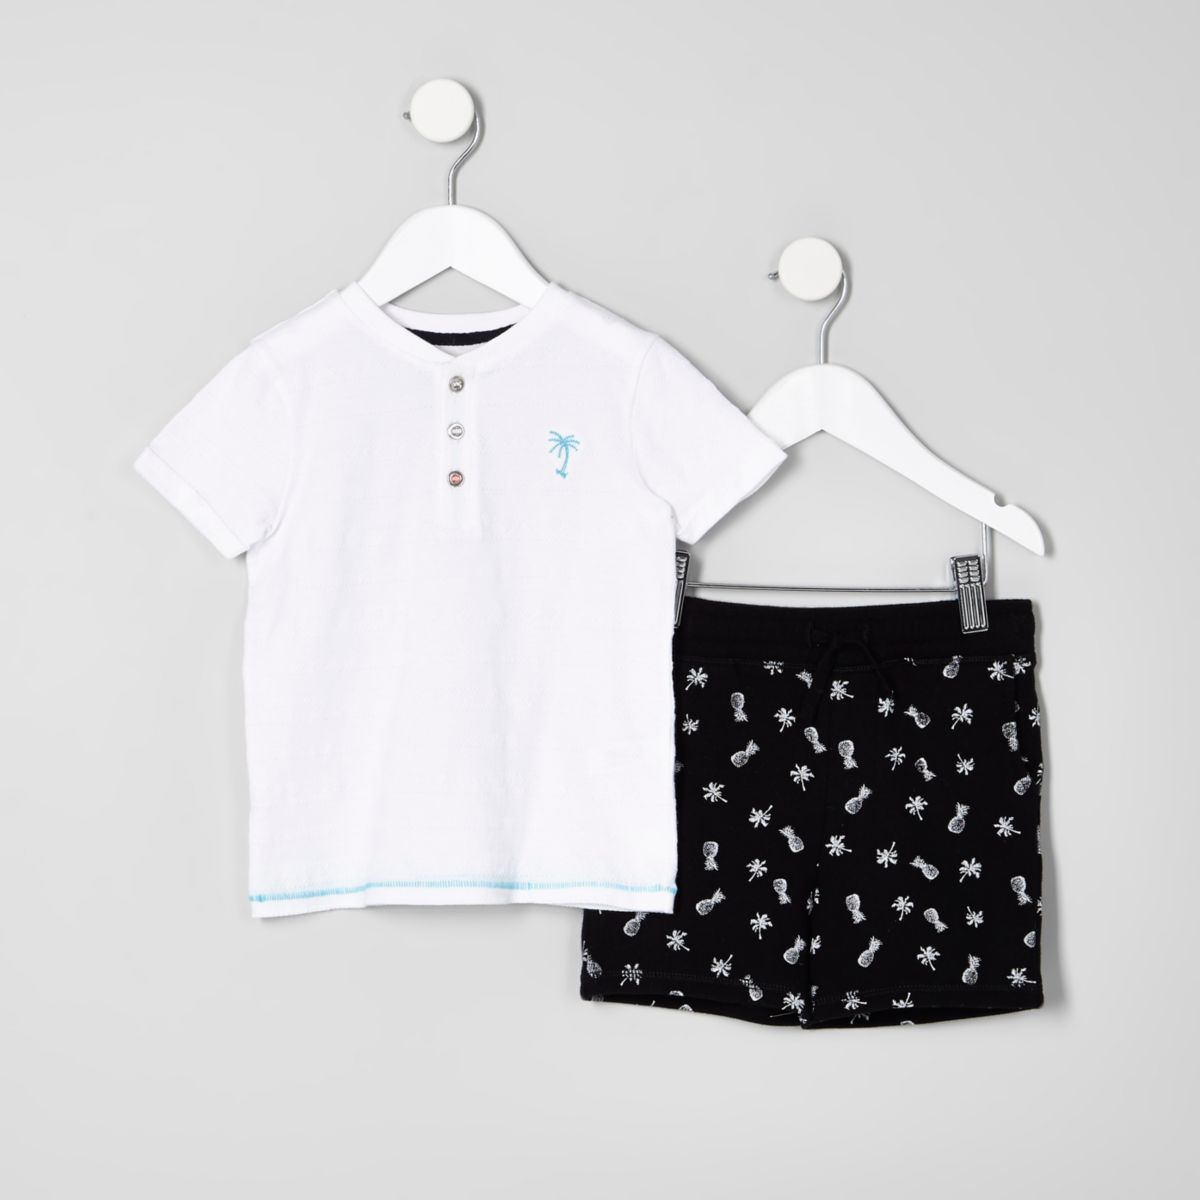 Mini boys white palm T-shirt outfit